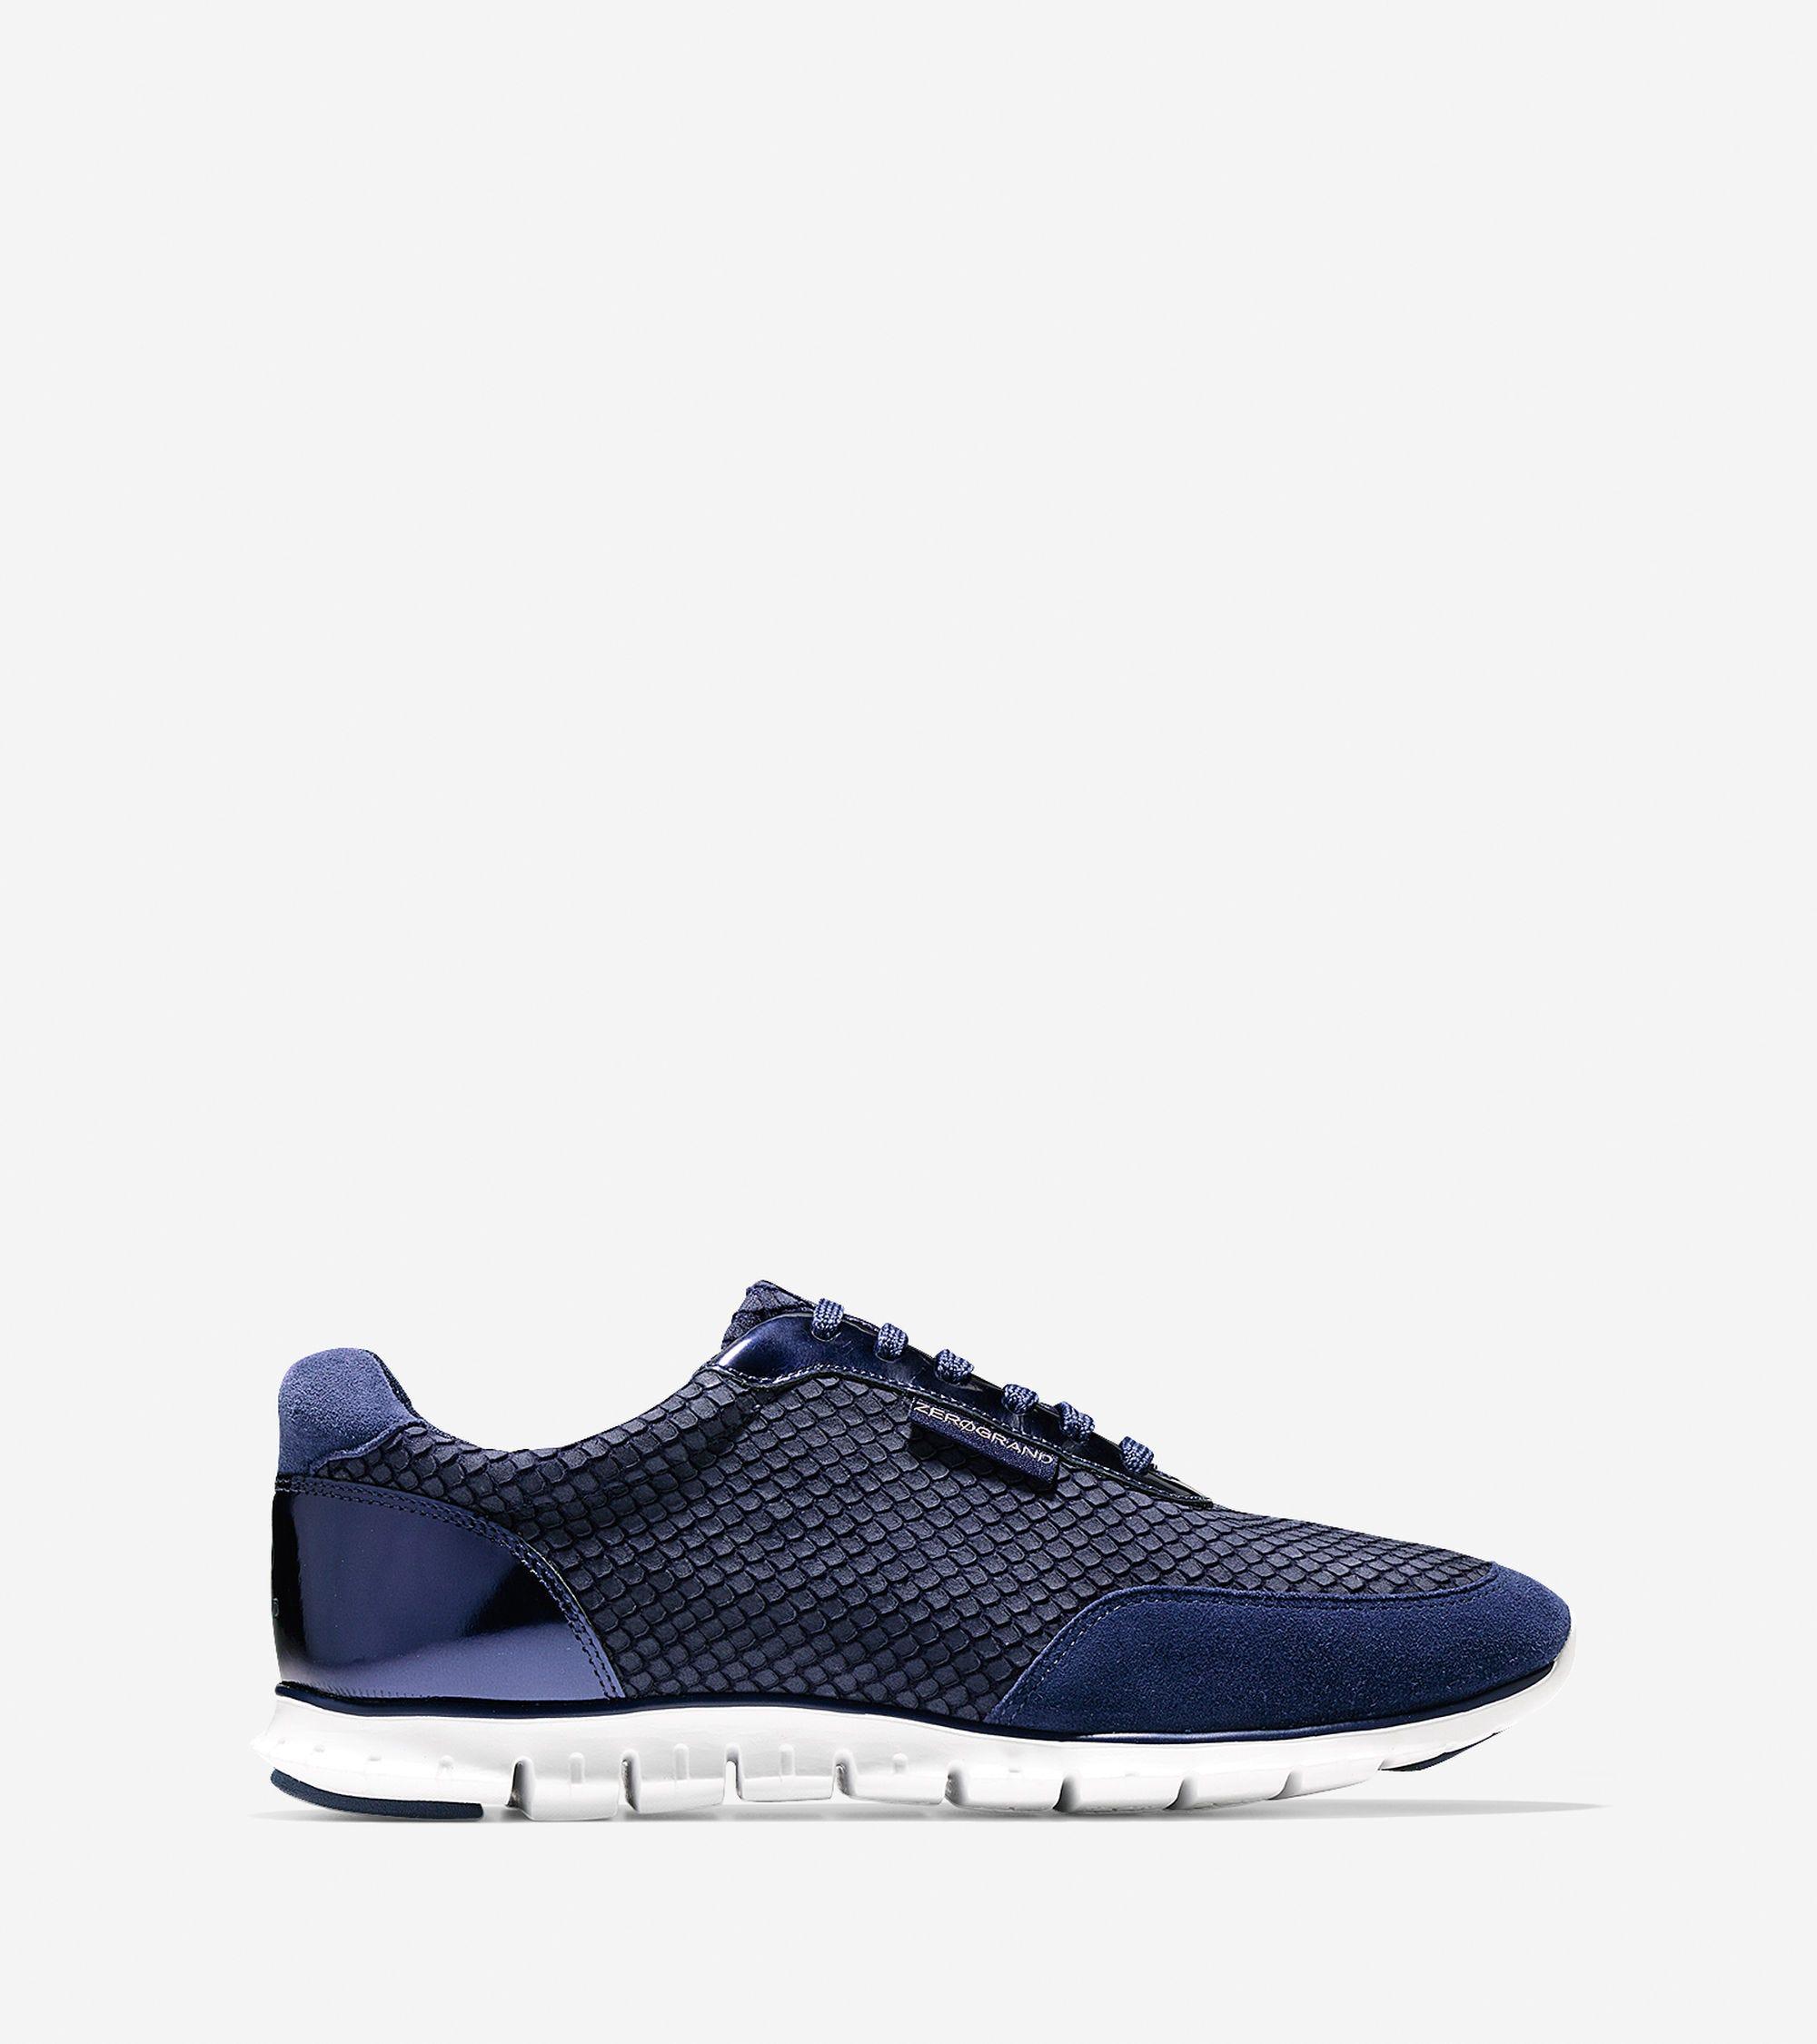 Cool Fashion Sneakers Colorful Kicks fe8faaad6